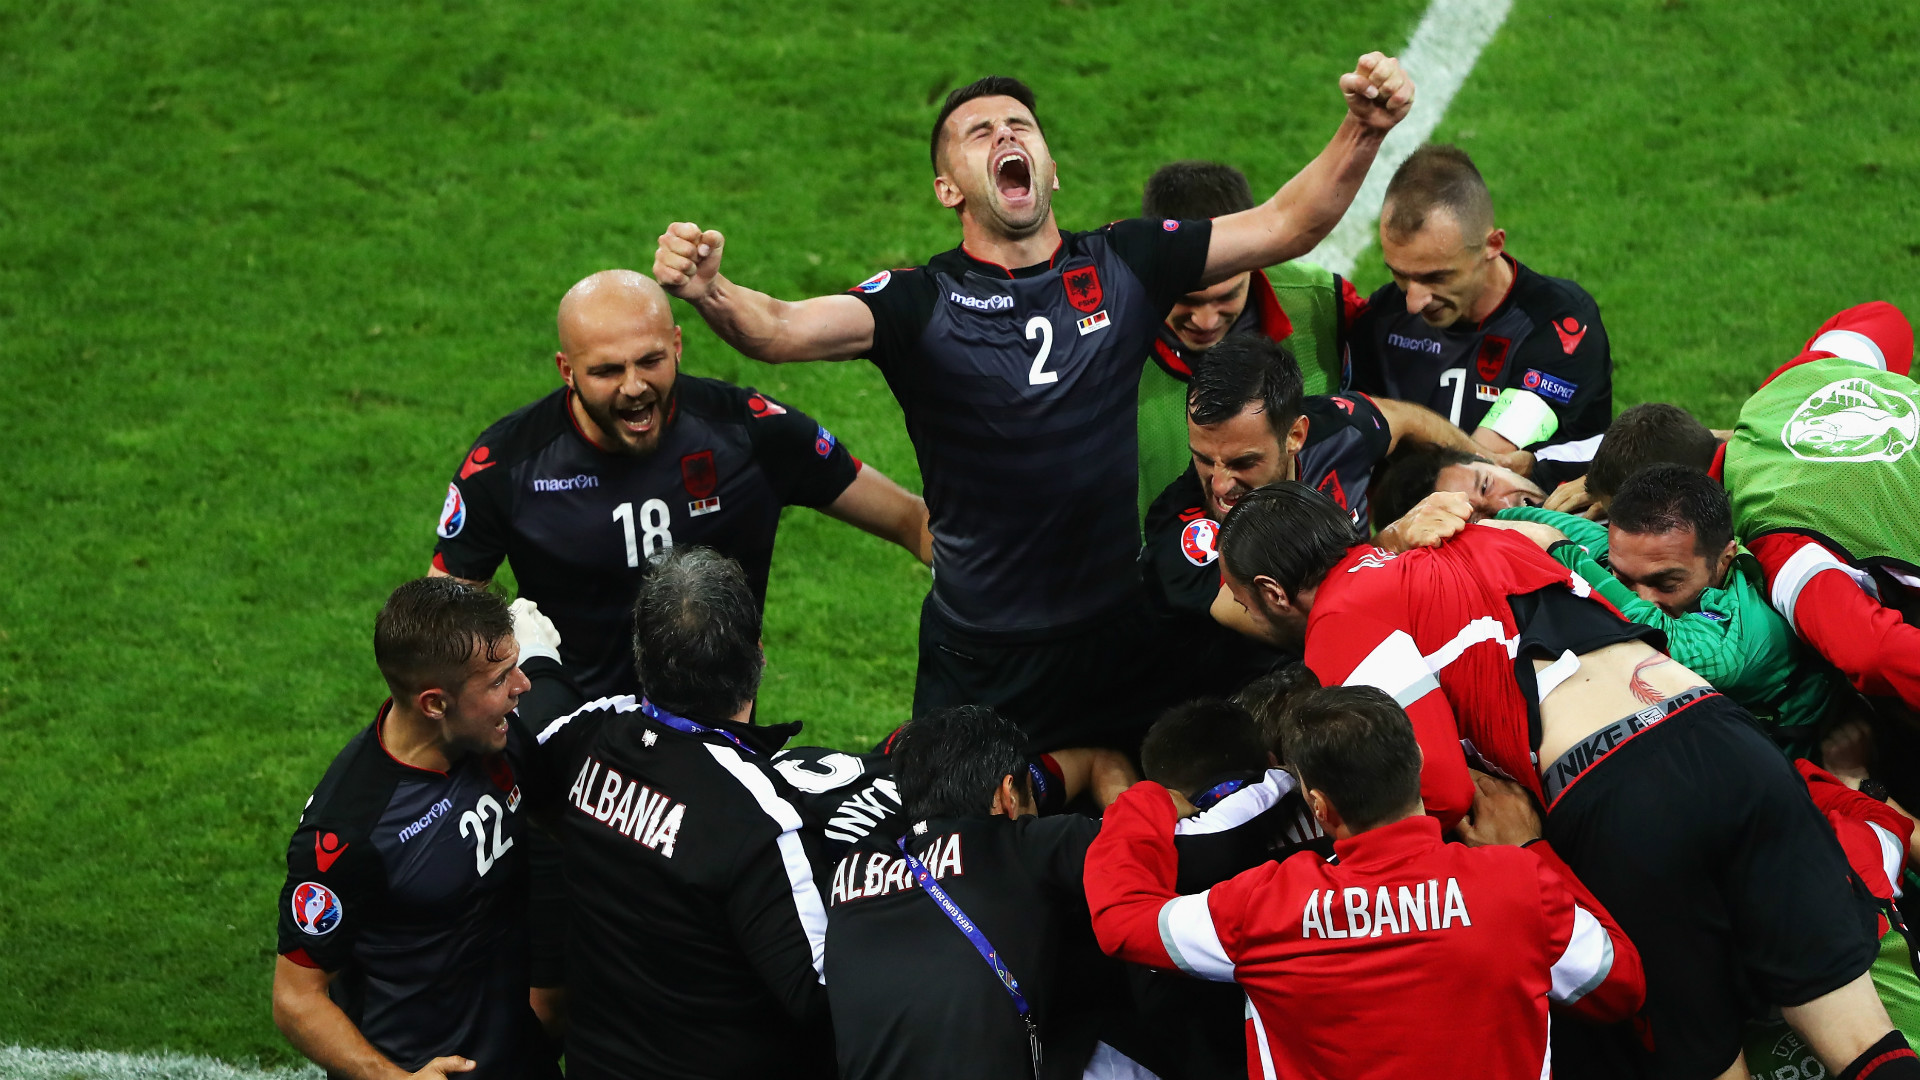 Romania v Albania 190616